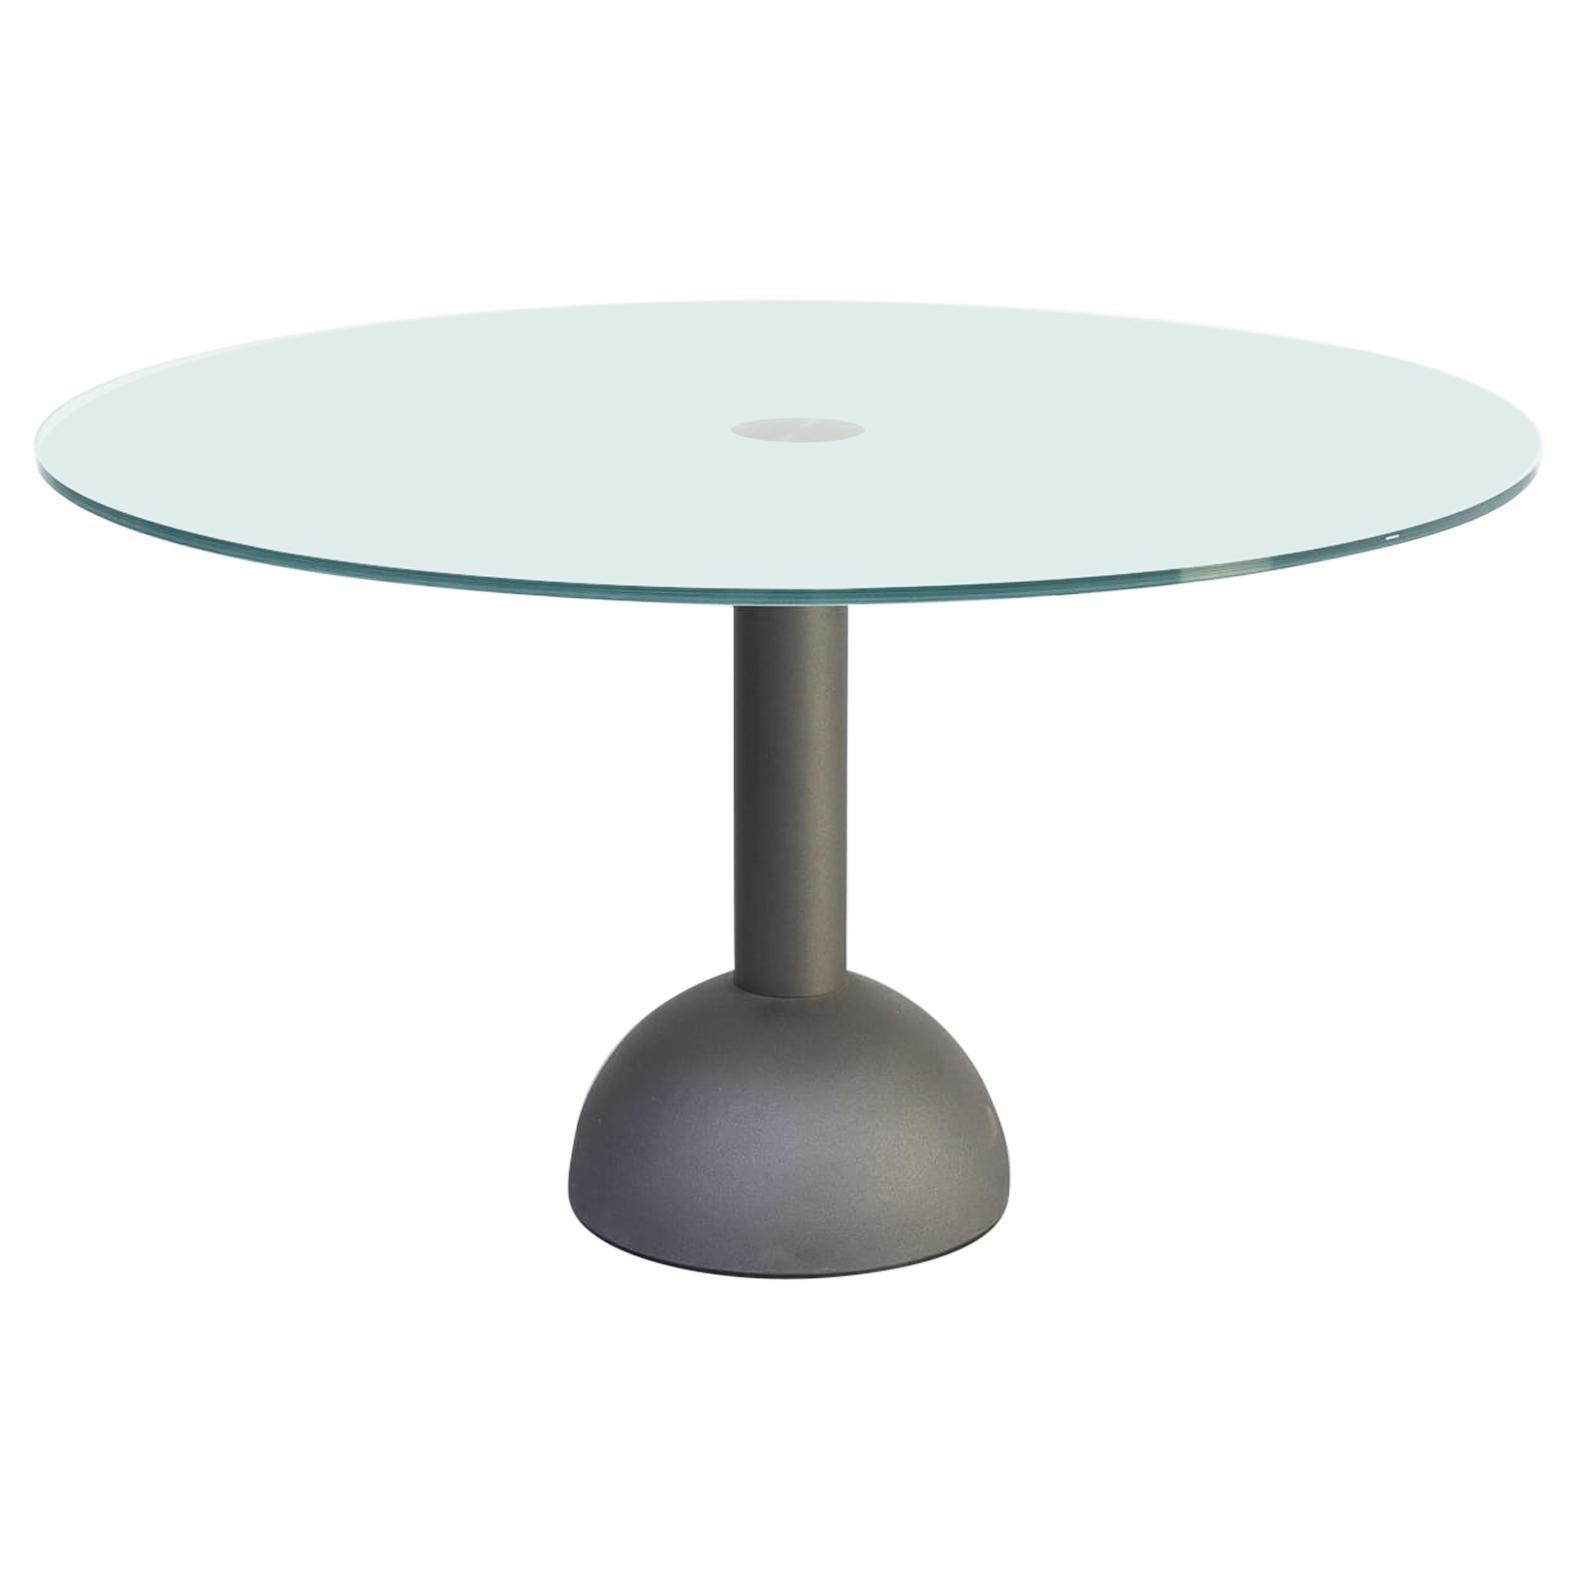 1980s Massimo and Lella Vignelli 'Calice' Dining Table for Poltrona Frau